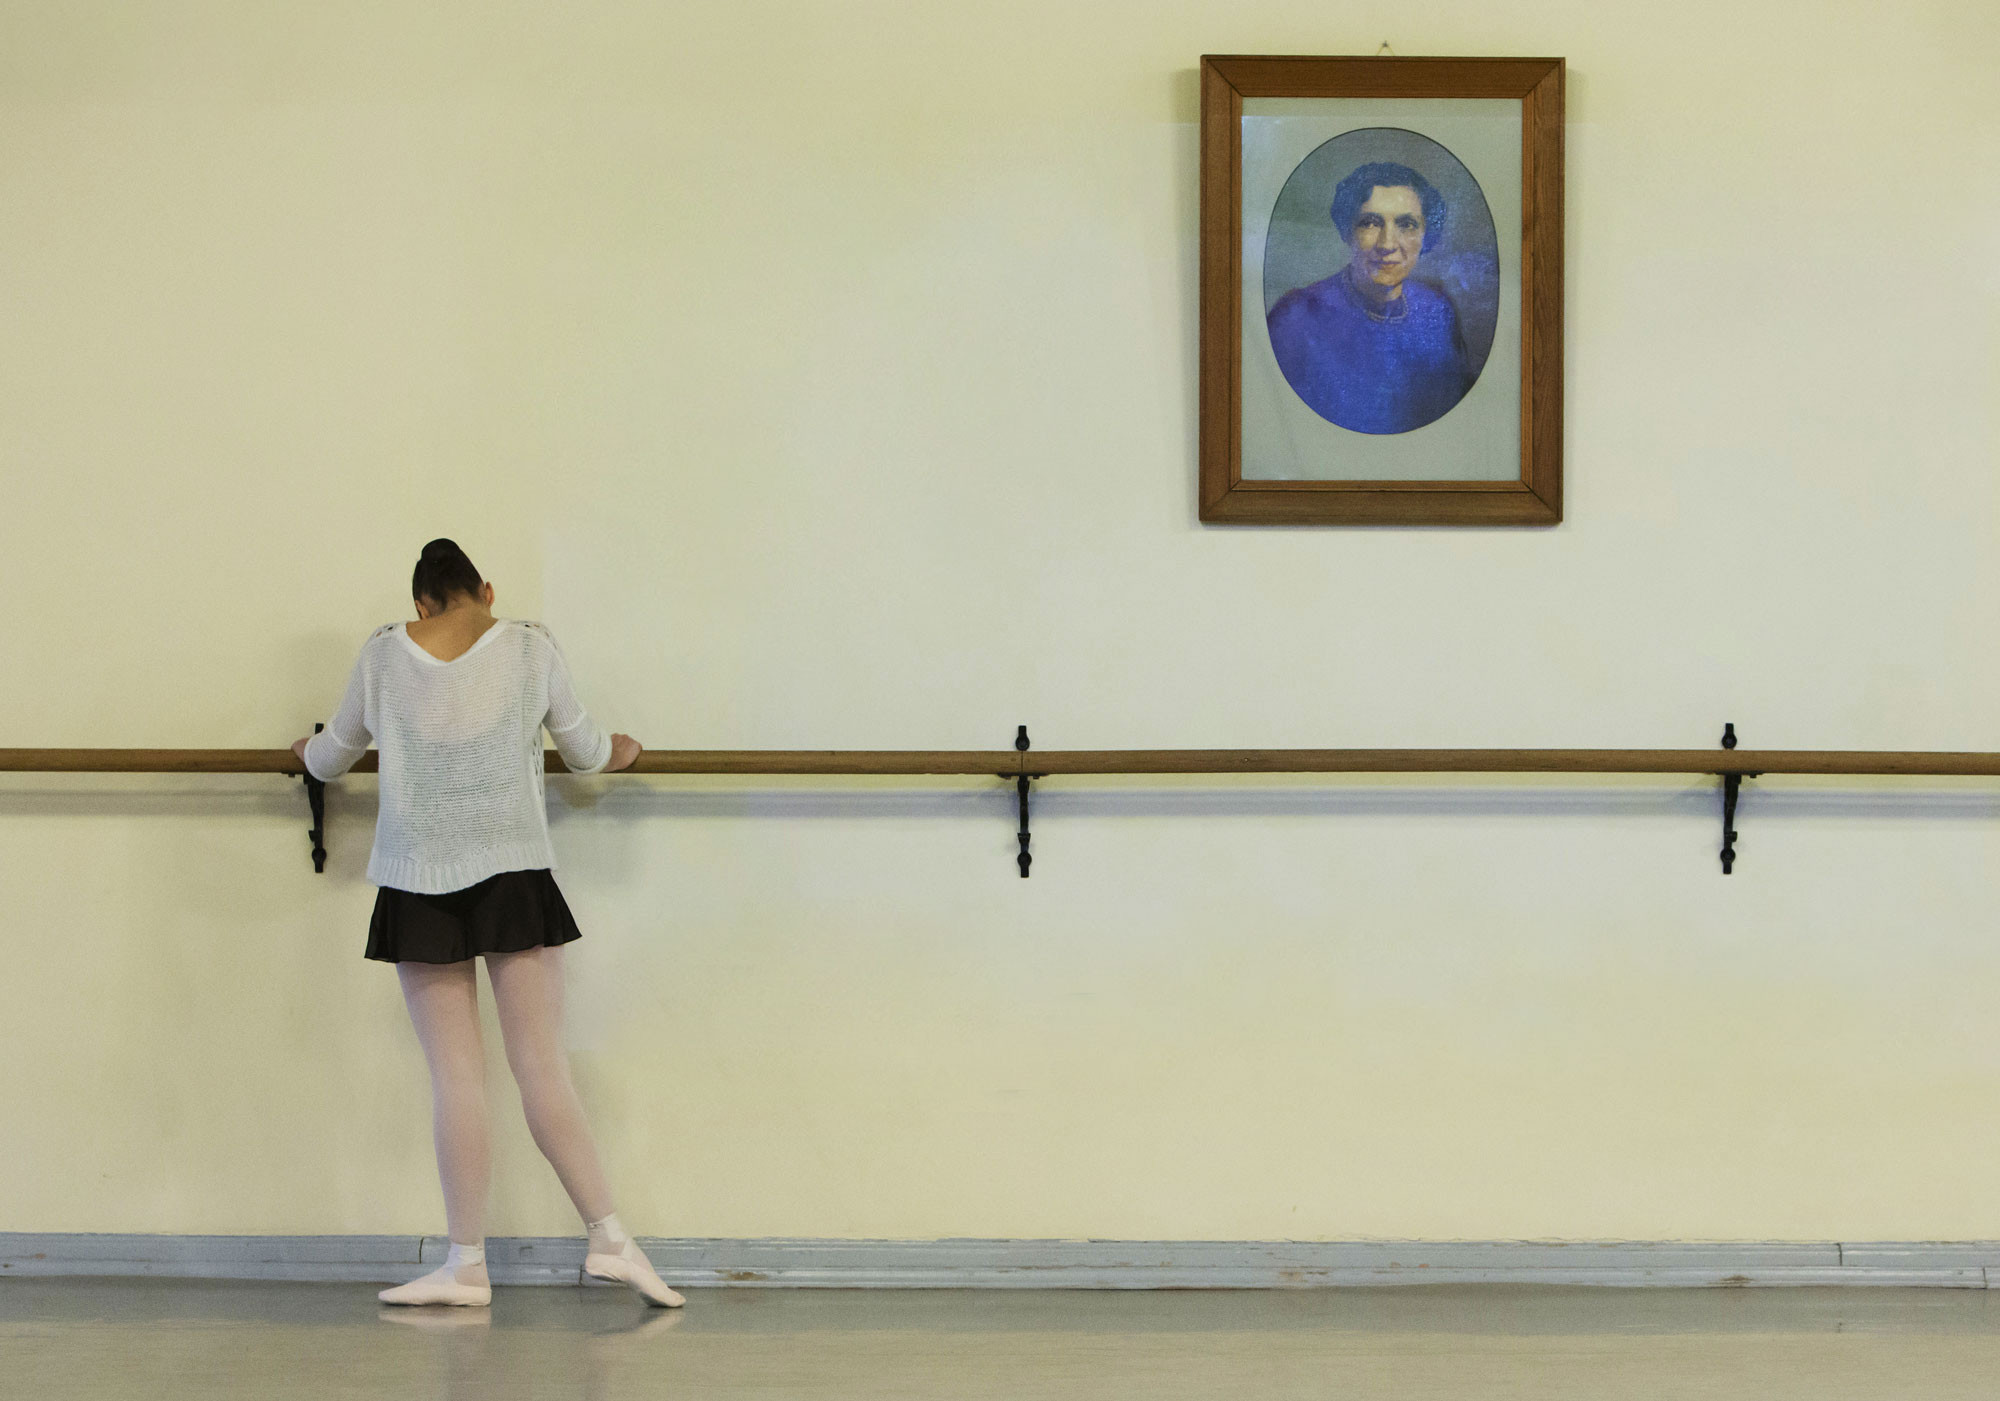 <p>Фото: &copy; РИА Новости/Игорь Руссак</p>